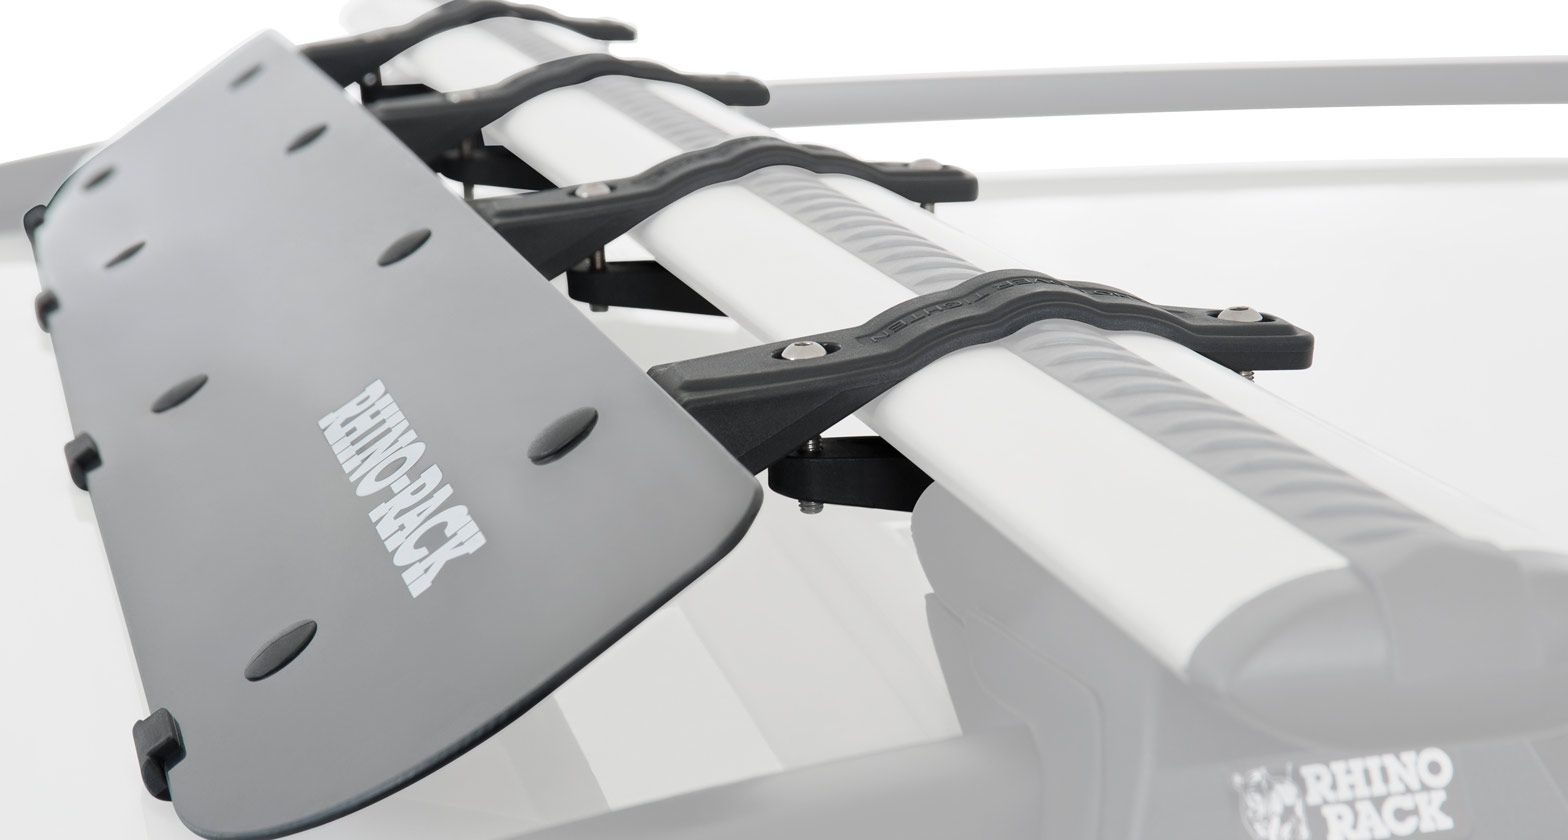 Diy Roof Rack Fairing (With images) Kayak roof rack